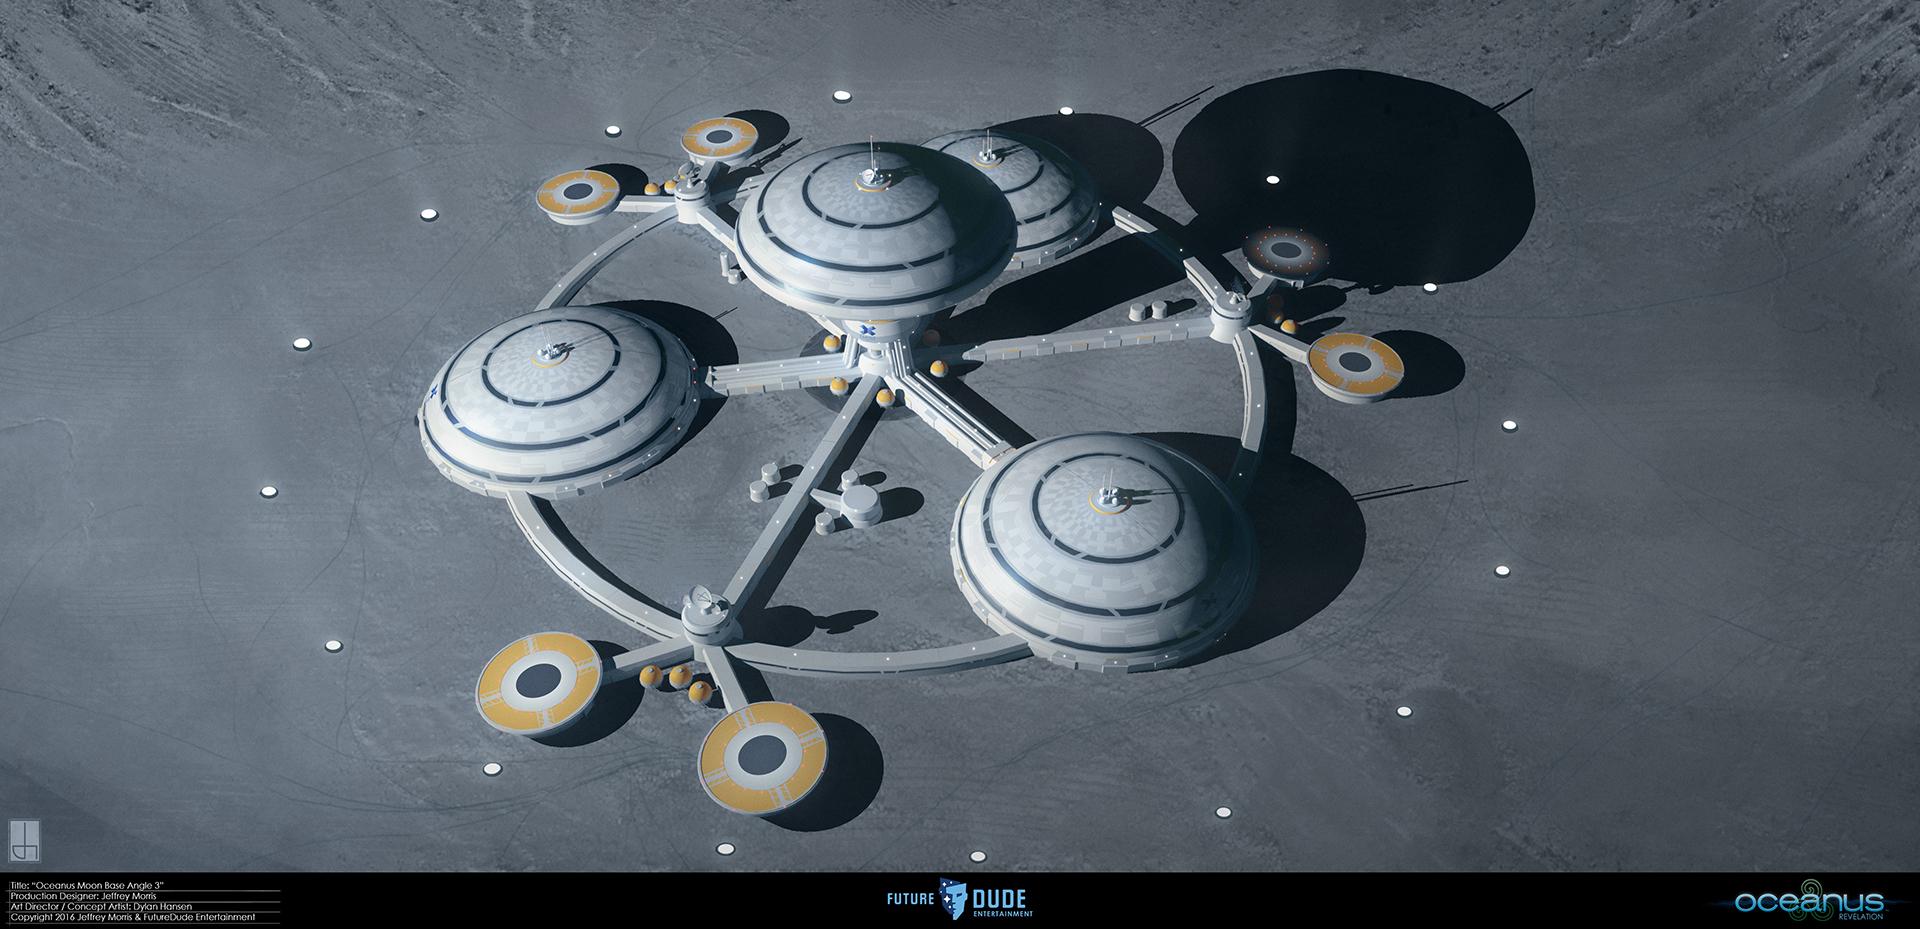 Oceanus Moon Base Design 1.jpg